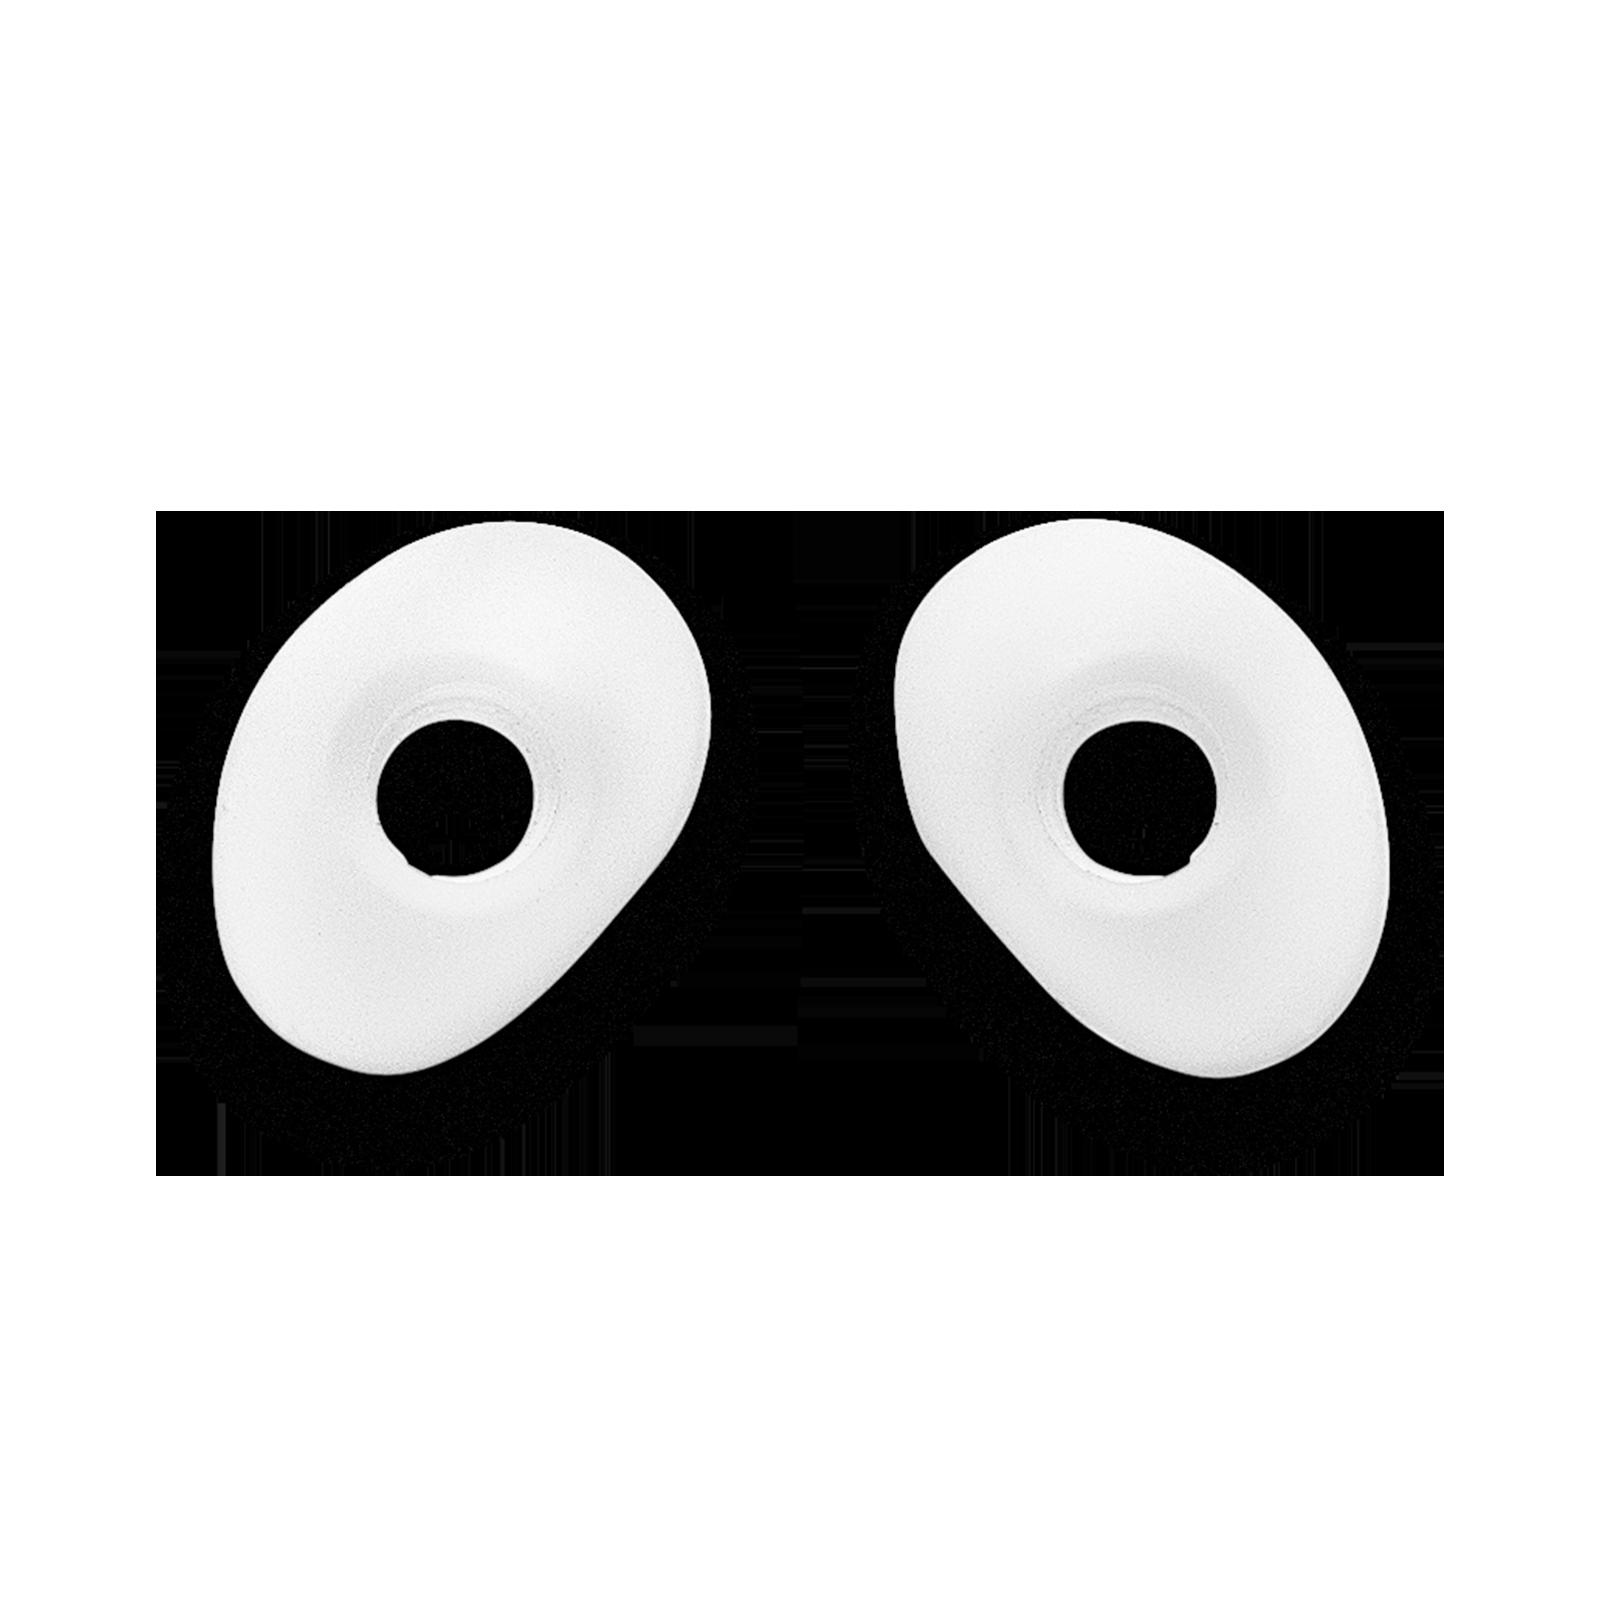 Ear hook set for Reflect fit (Medium) - Transparent - Ear pads M (L+R) - Hero